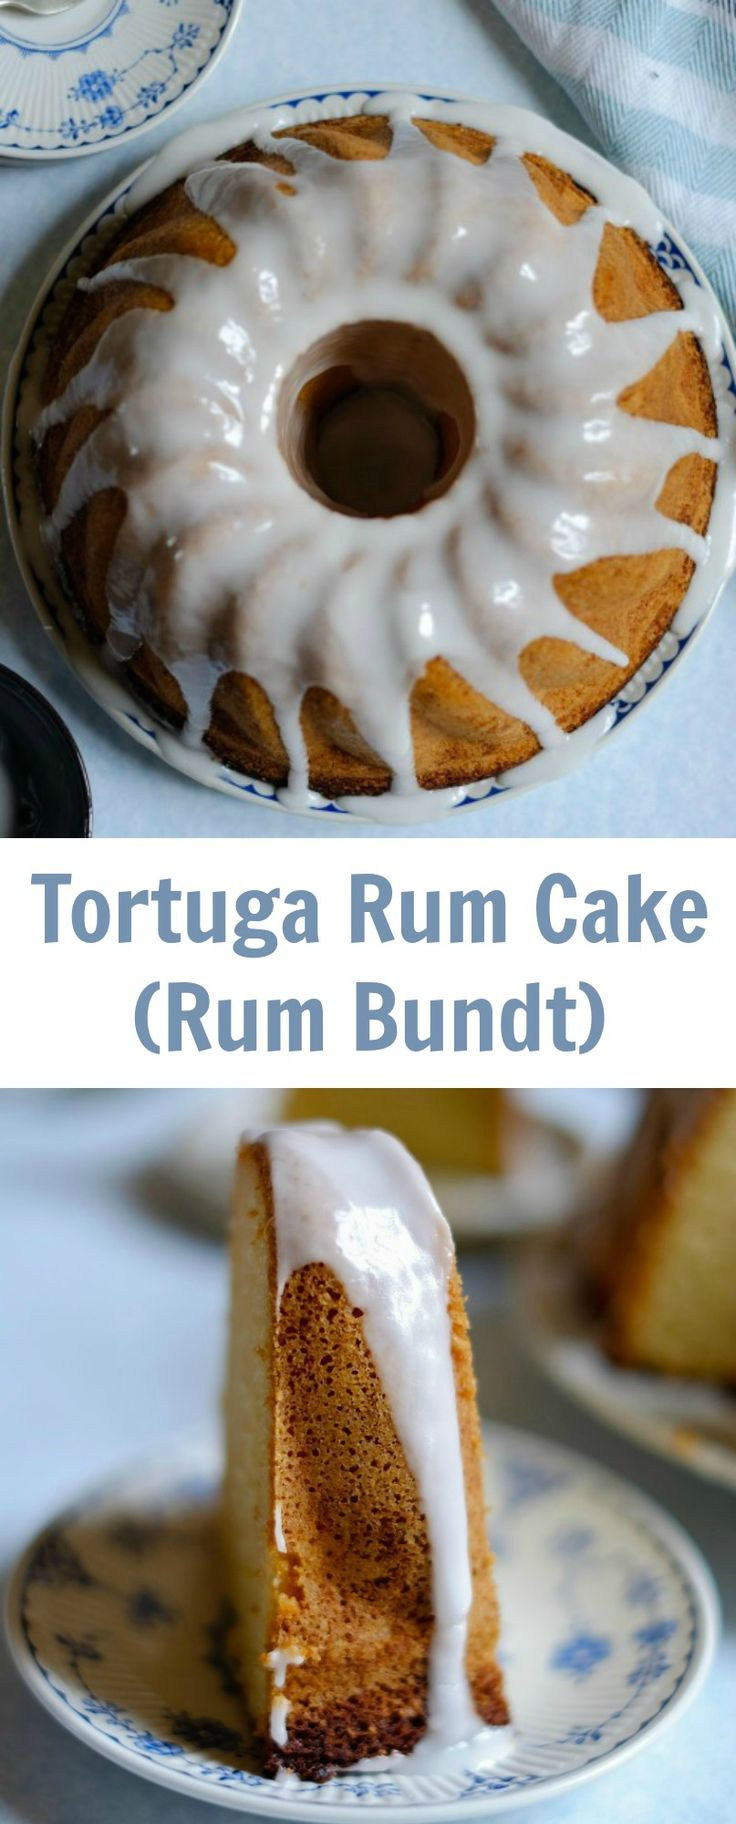 Rum Bundt (Tortuga Rum Cake) - Patisserie Makes Perfect